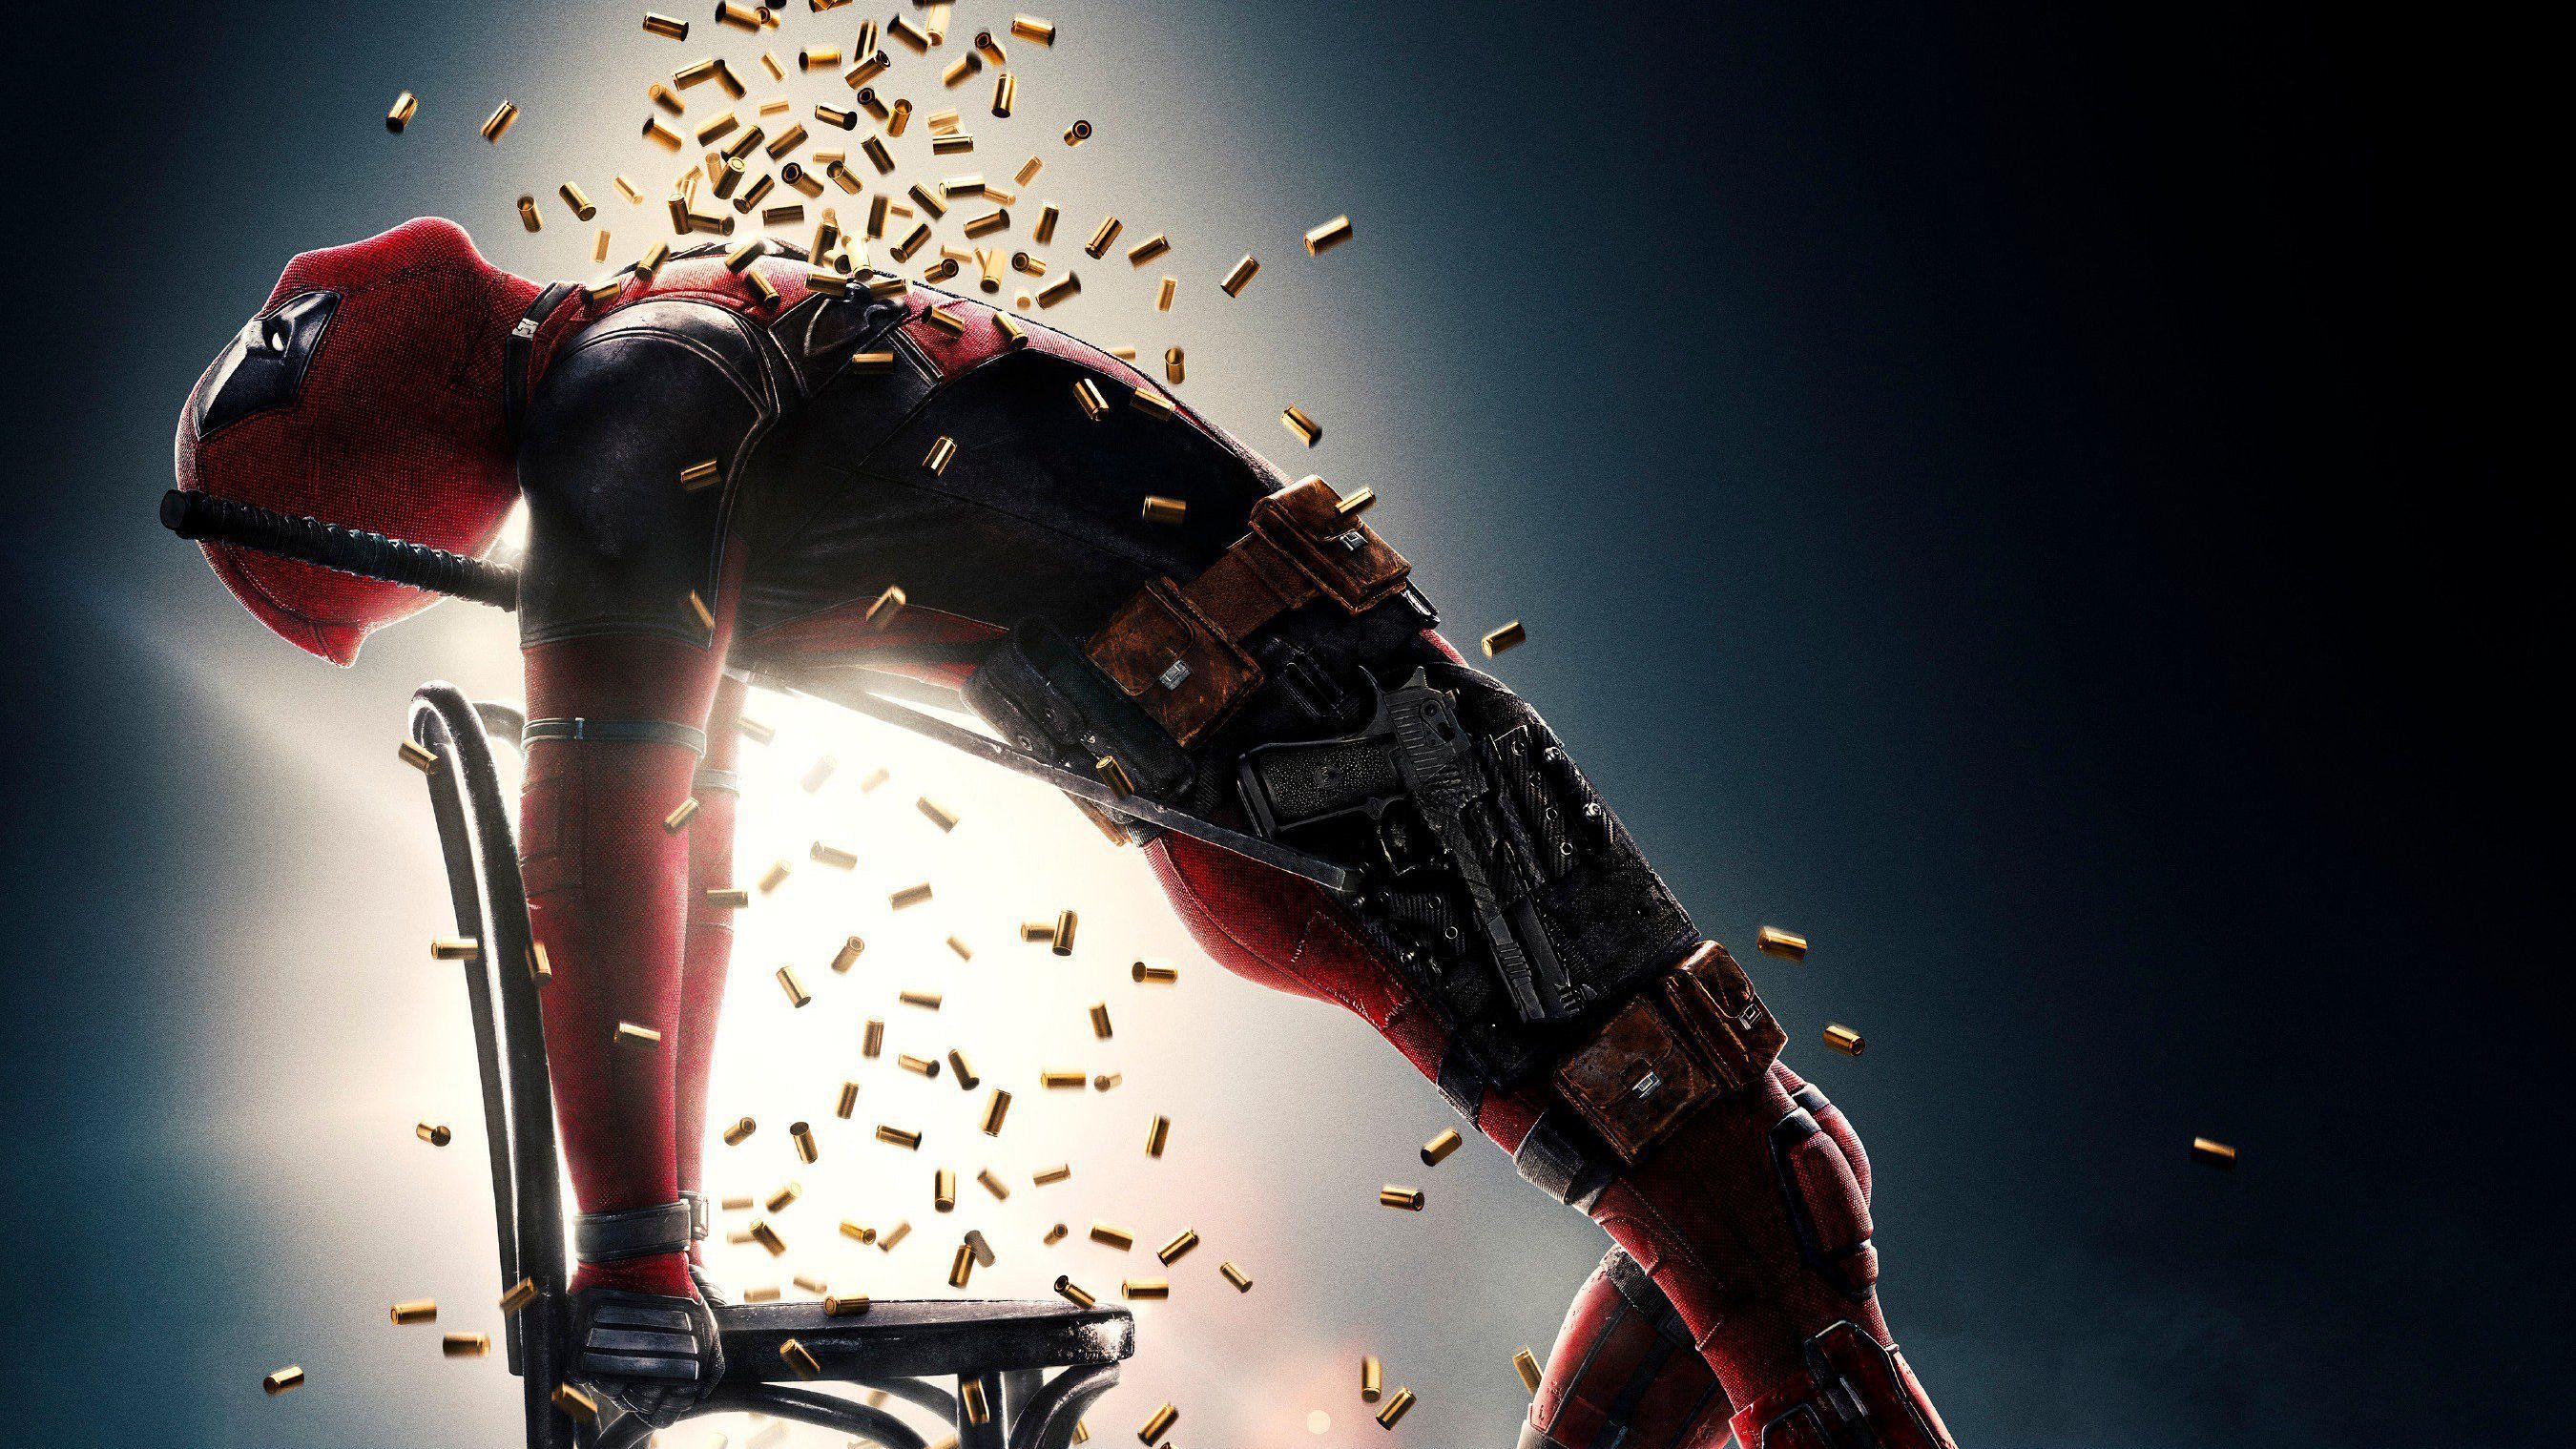 Deadpool 2 Movie Wallpapers Top Free Deadpool 2 Movie